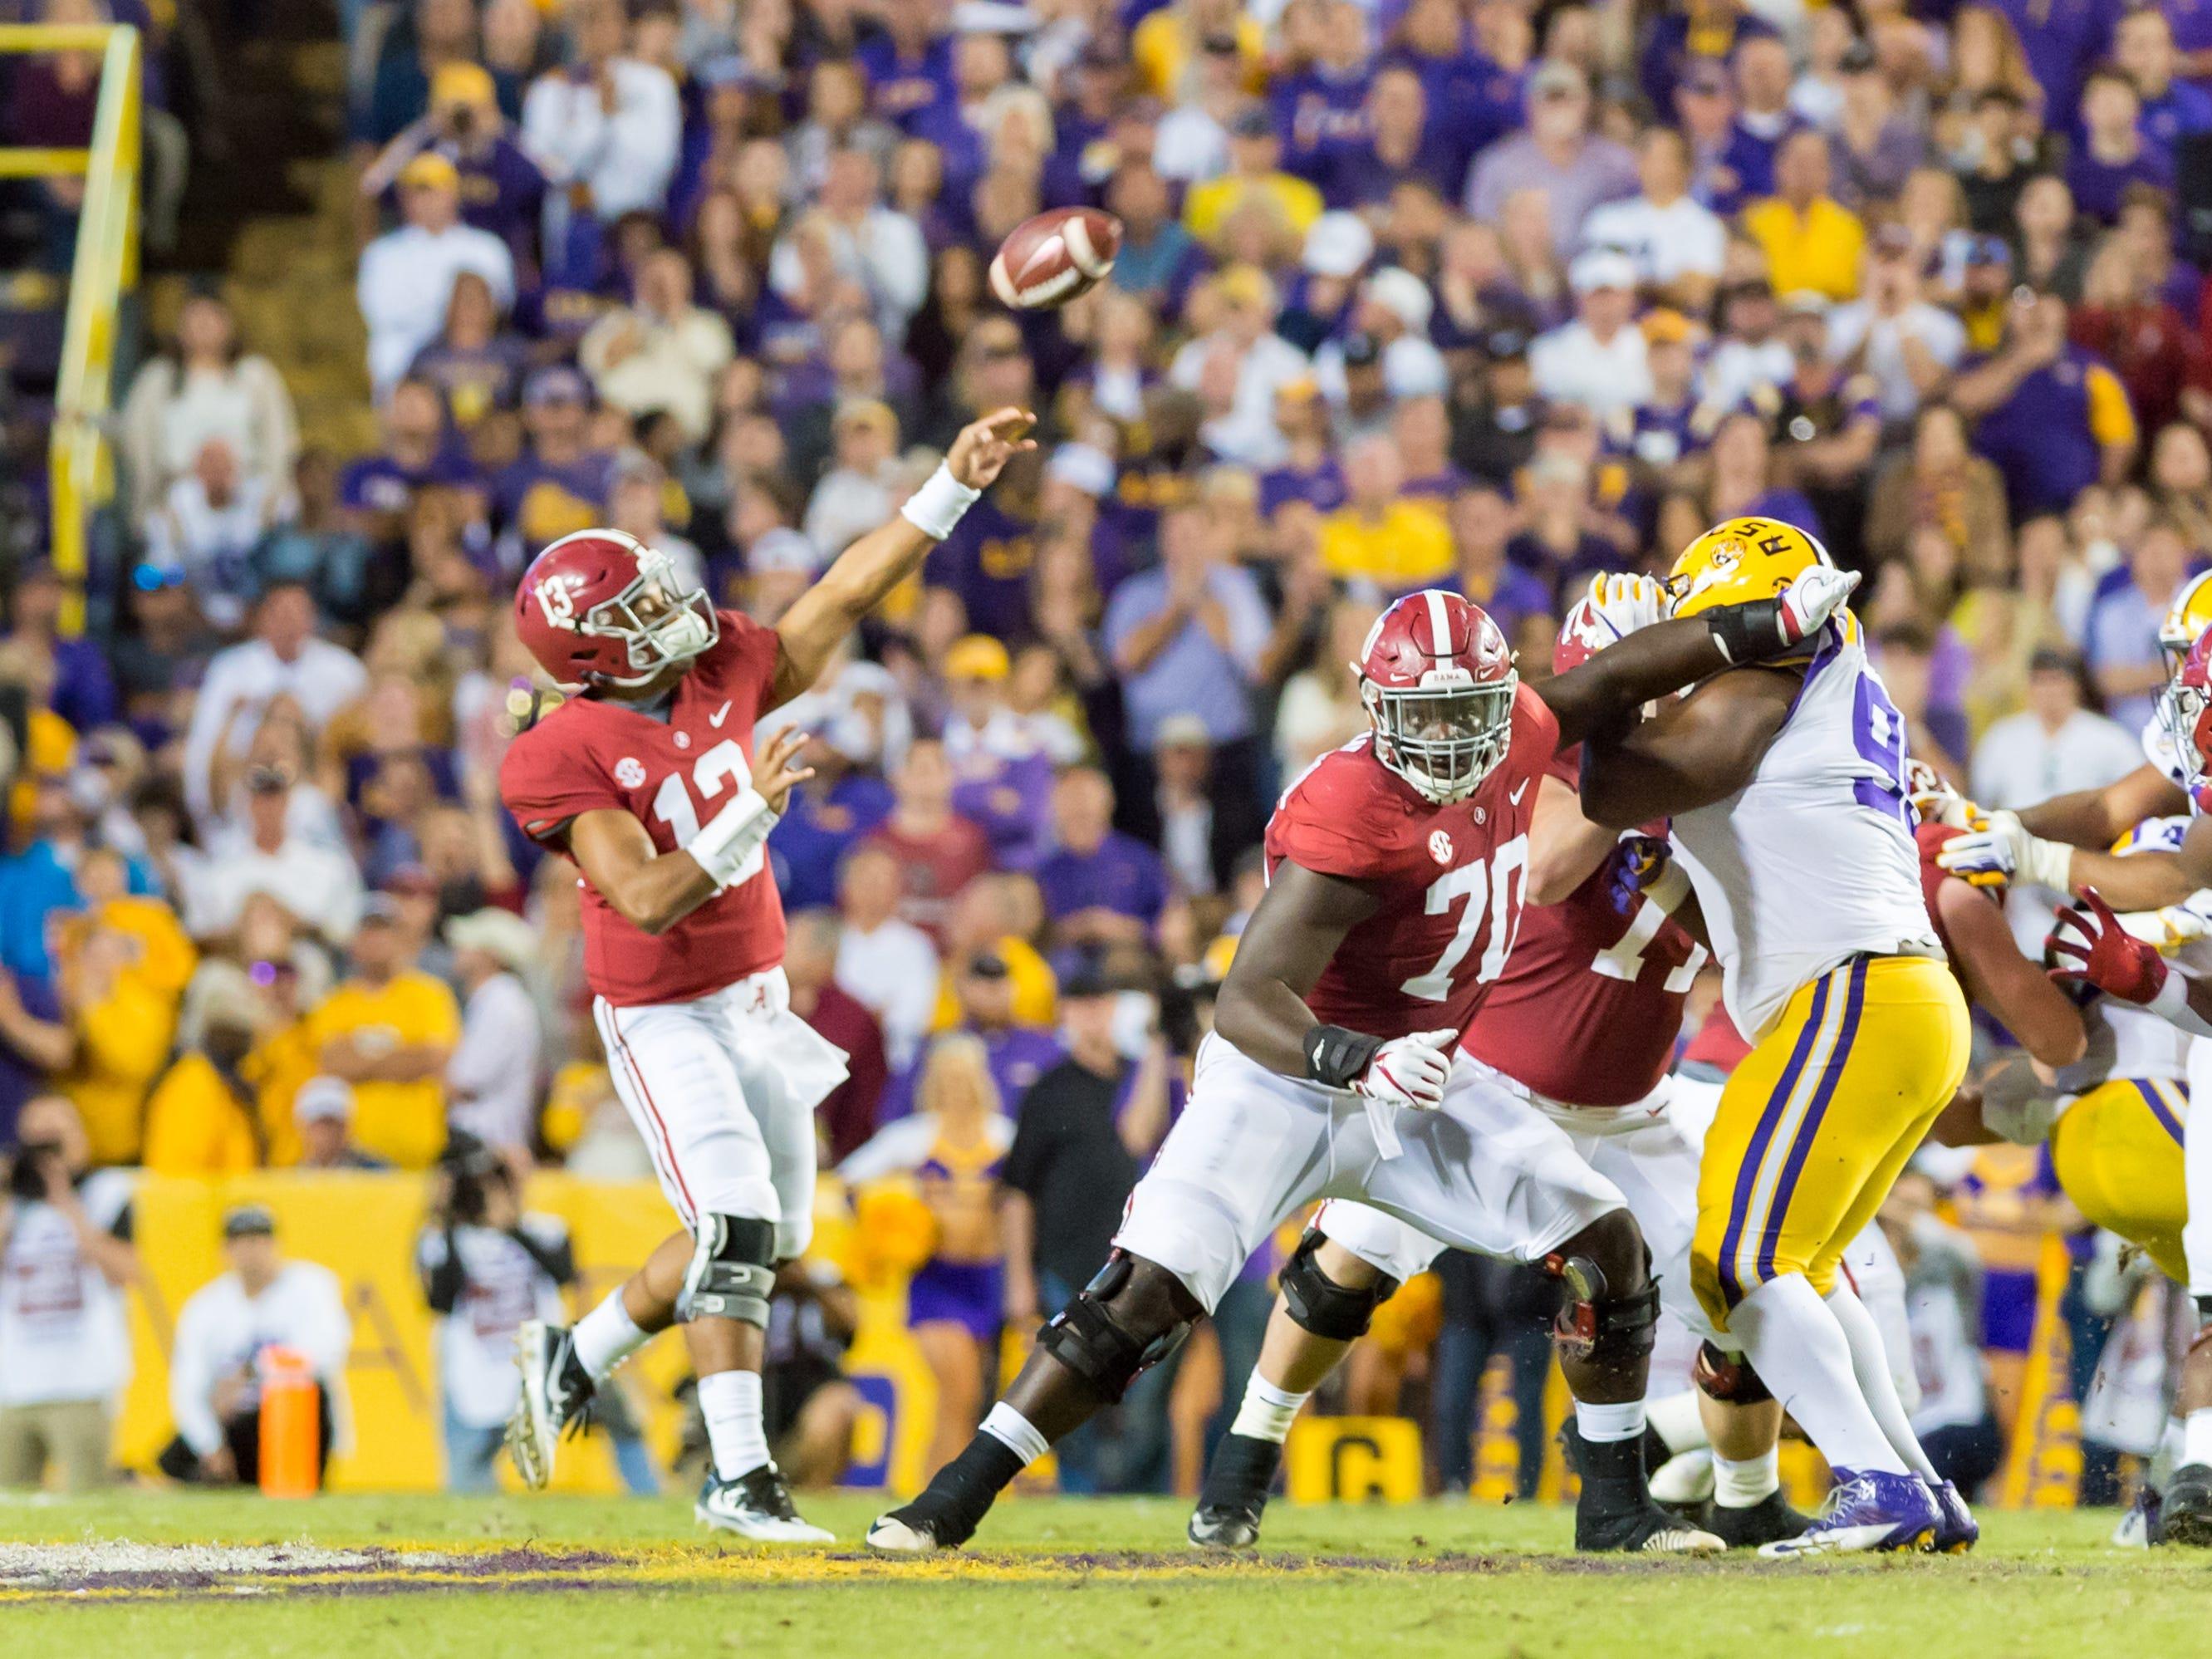 Alabama quarterback Tua Tagovaila throws a pass  as The #4 LSU Tigers take on the #1 ranked Alabama Crimson Tide in Tiger Stadium. Saturday, Nov. 3, 2018.